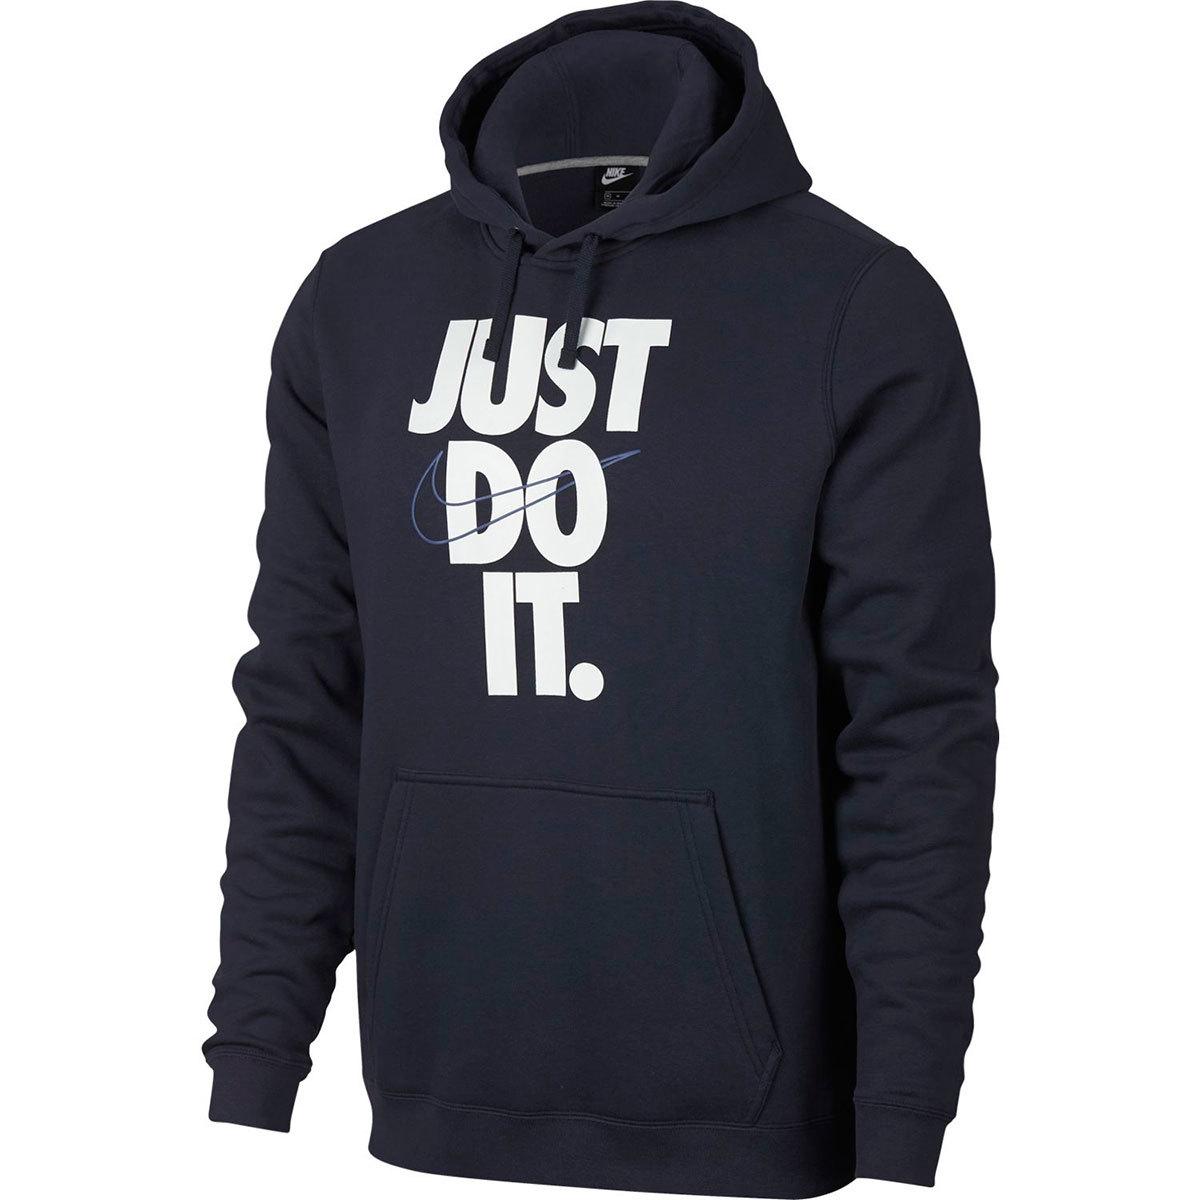 Nike Men's Nsw Fleece Hbr Pullover Hoodie - Blue, XXL